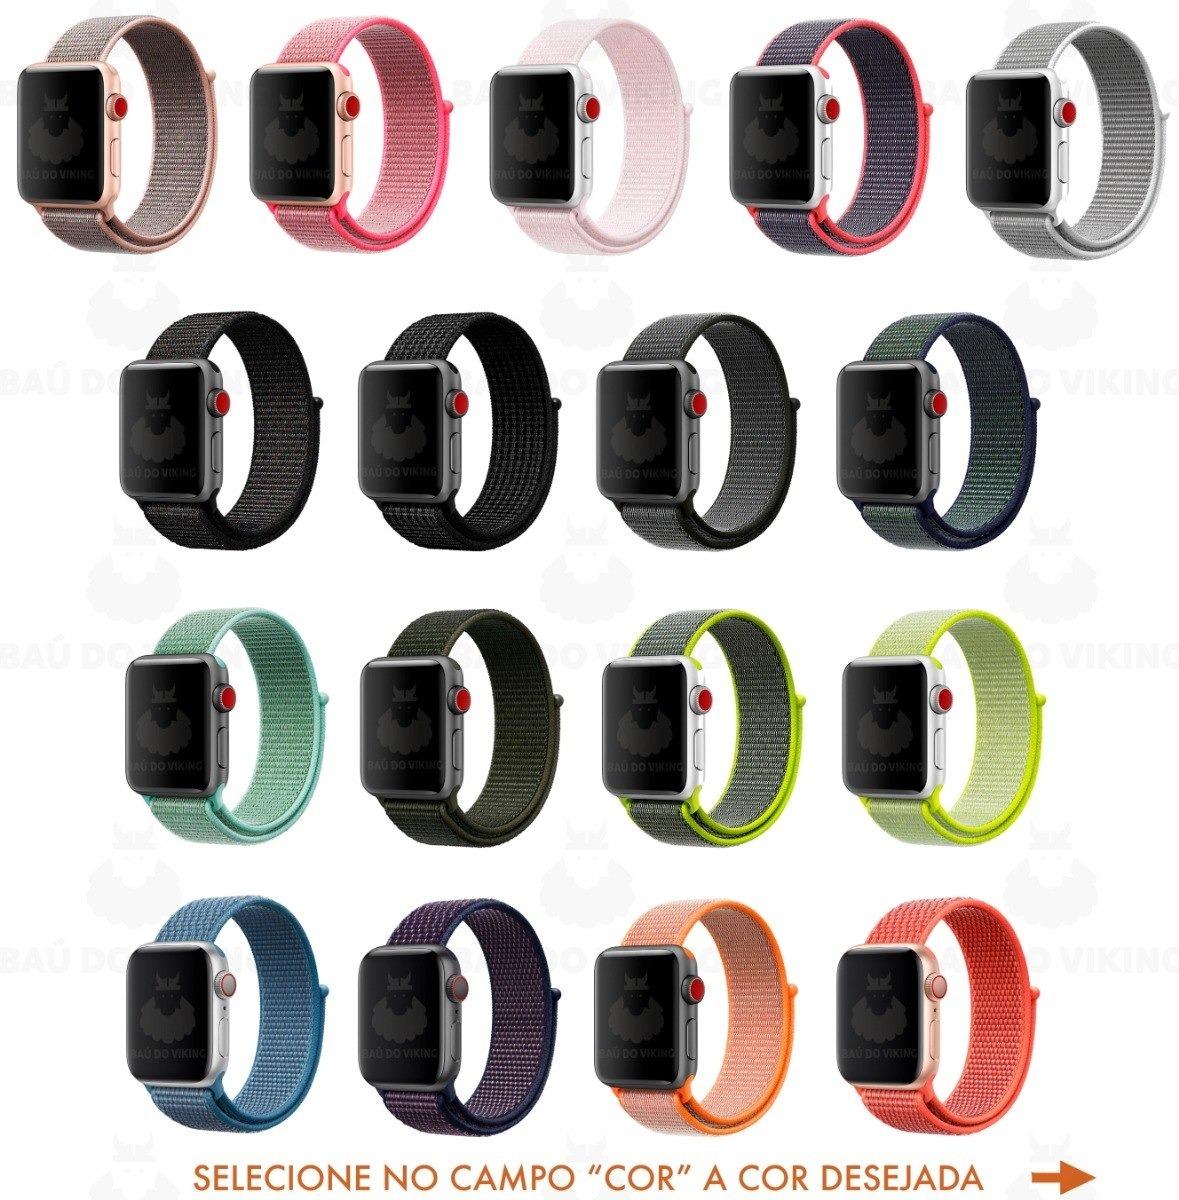 40f2f288294 pulseira nova nylon loop apple watch 42mm 38mm 44mm 40mm. Carregando zoom.